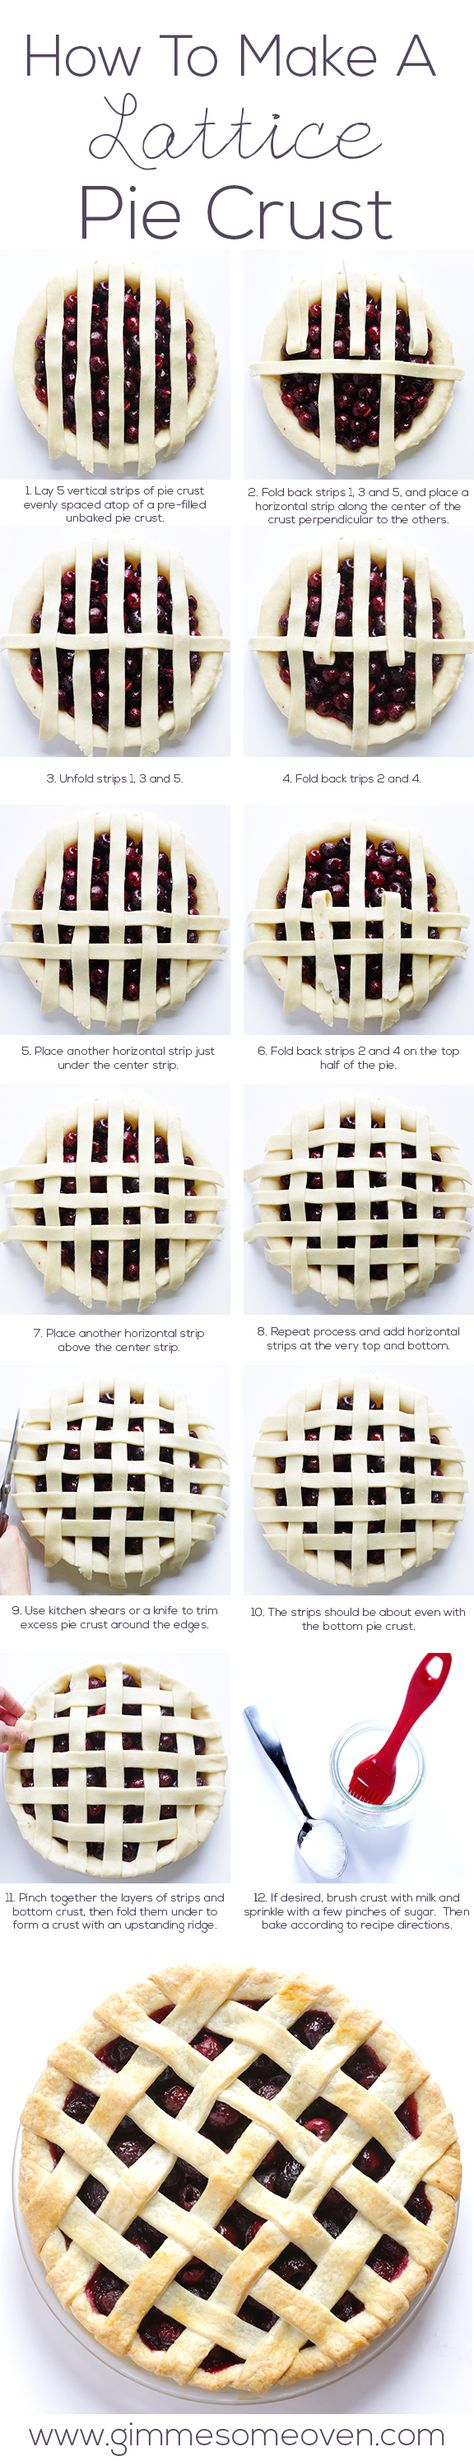 // How To Make A Lattice Pie Crust